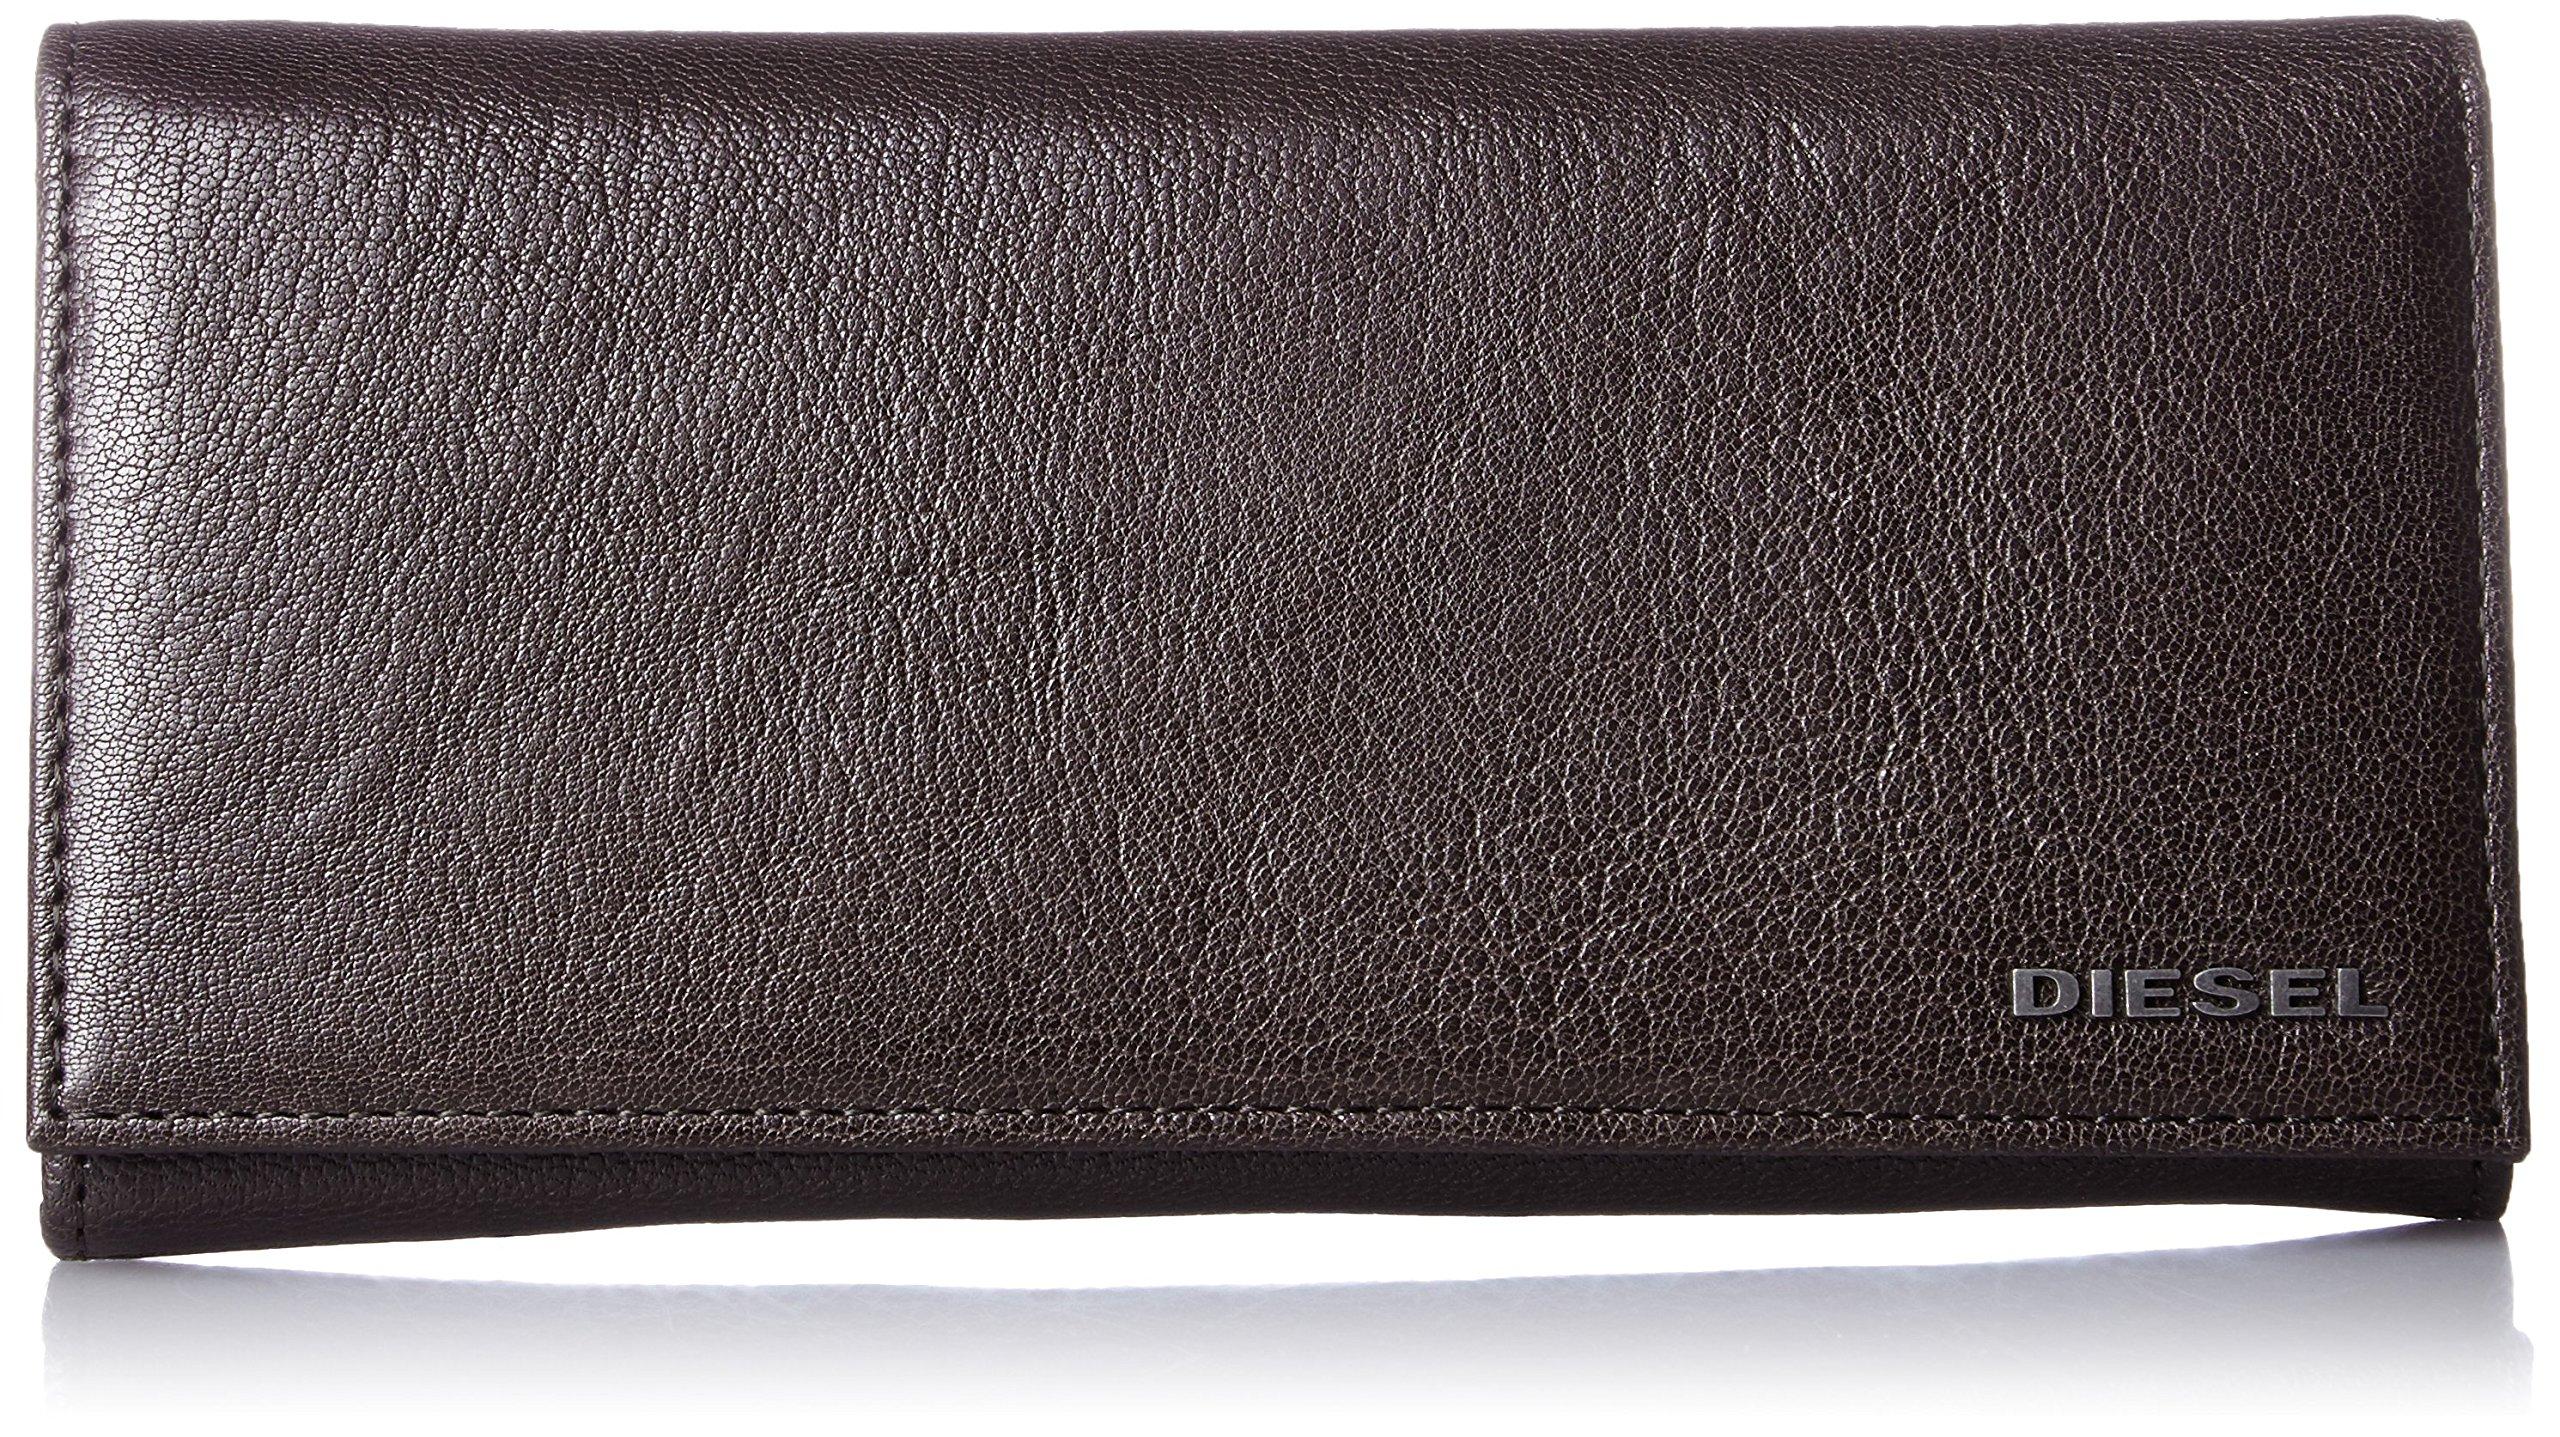 Diesel Men's Jem-J 24 A Day Wallet, Seal Brown, One Size